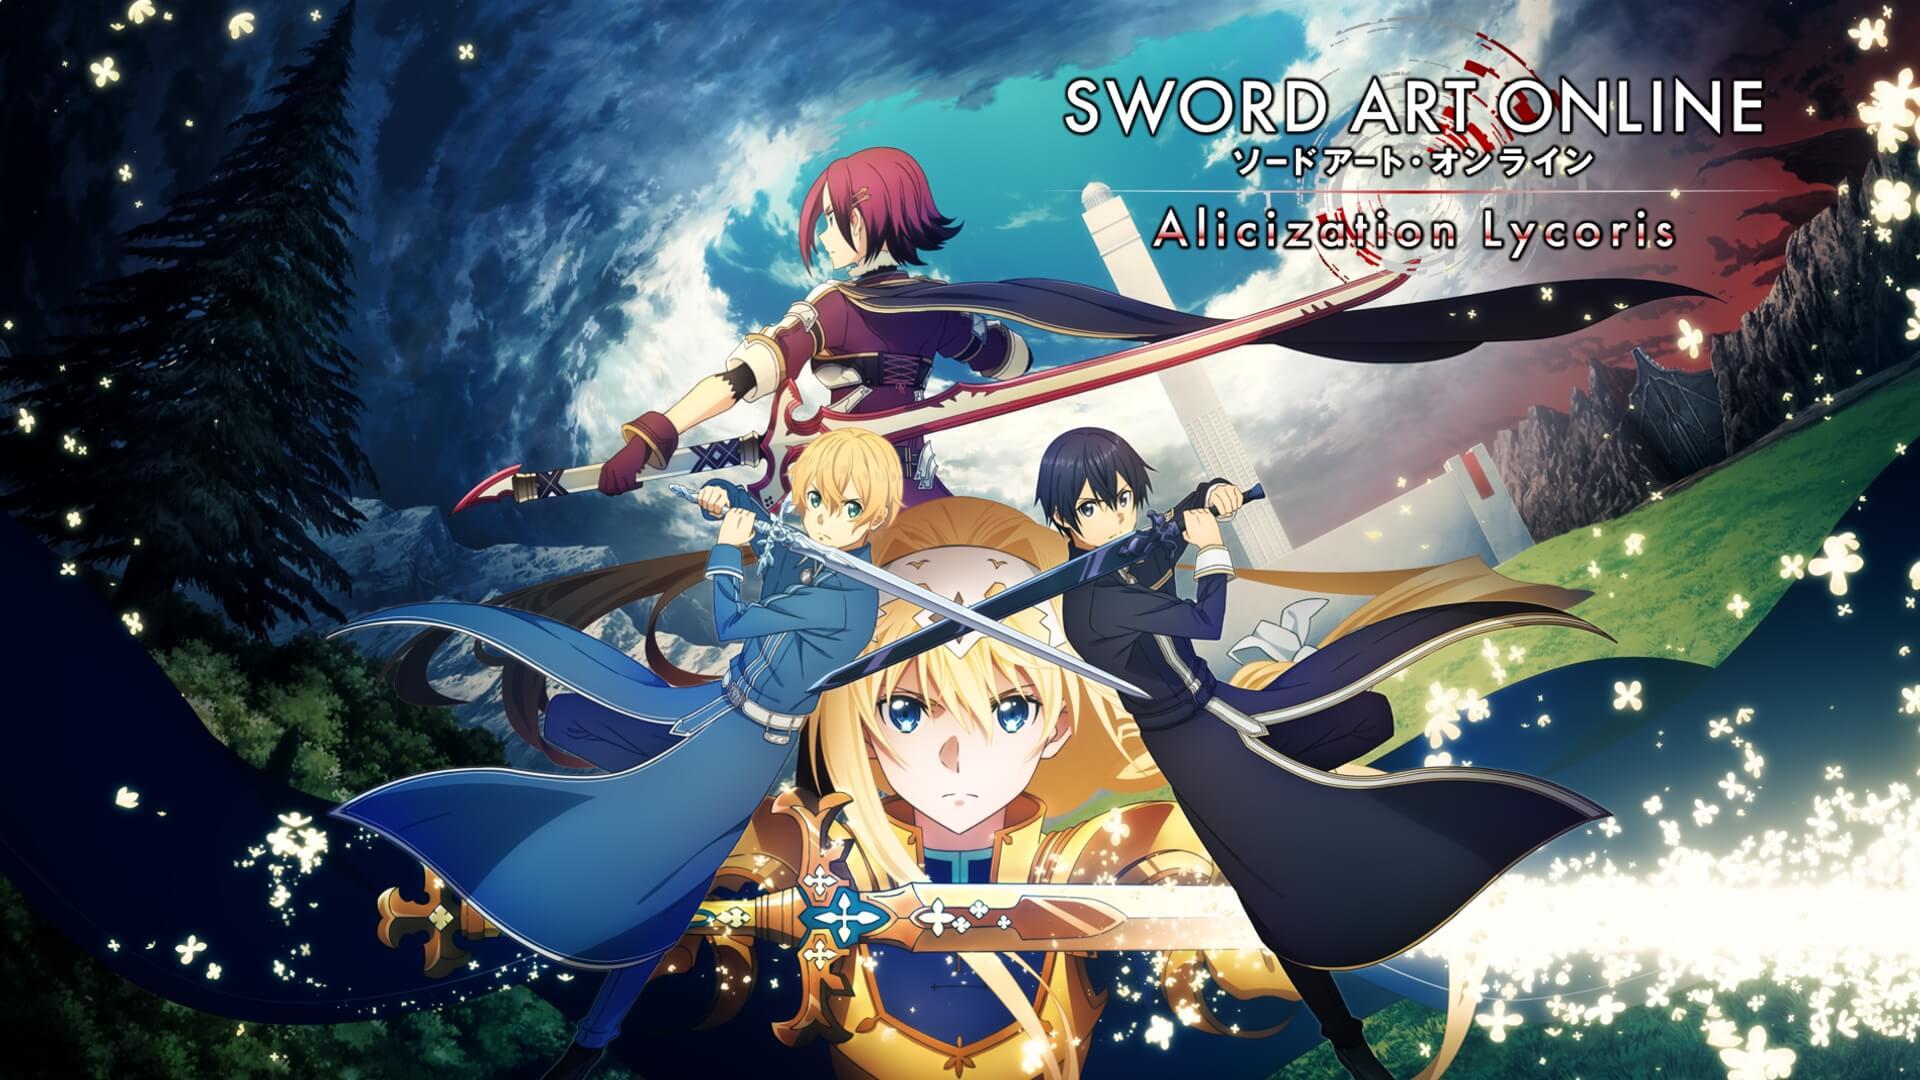 [Review] Sword Art Online: Alicization Lycoris